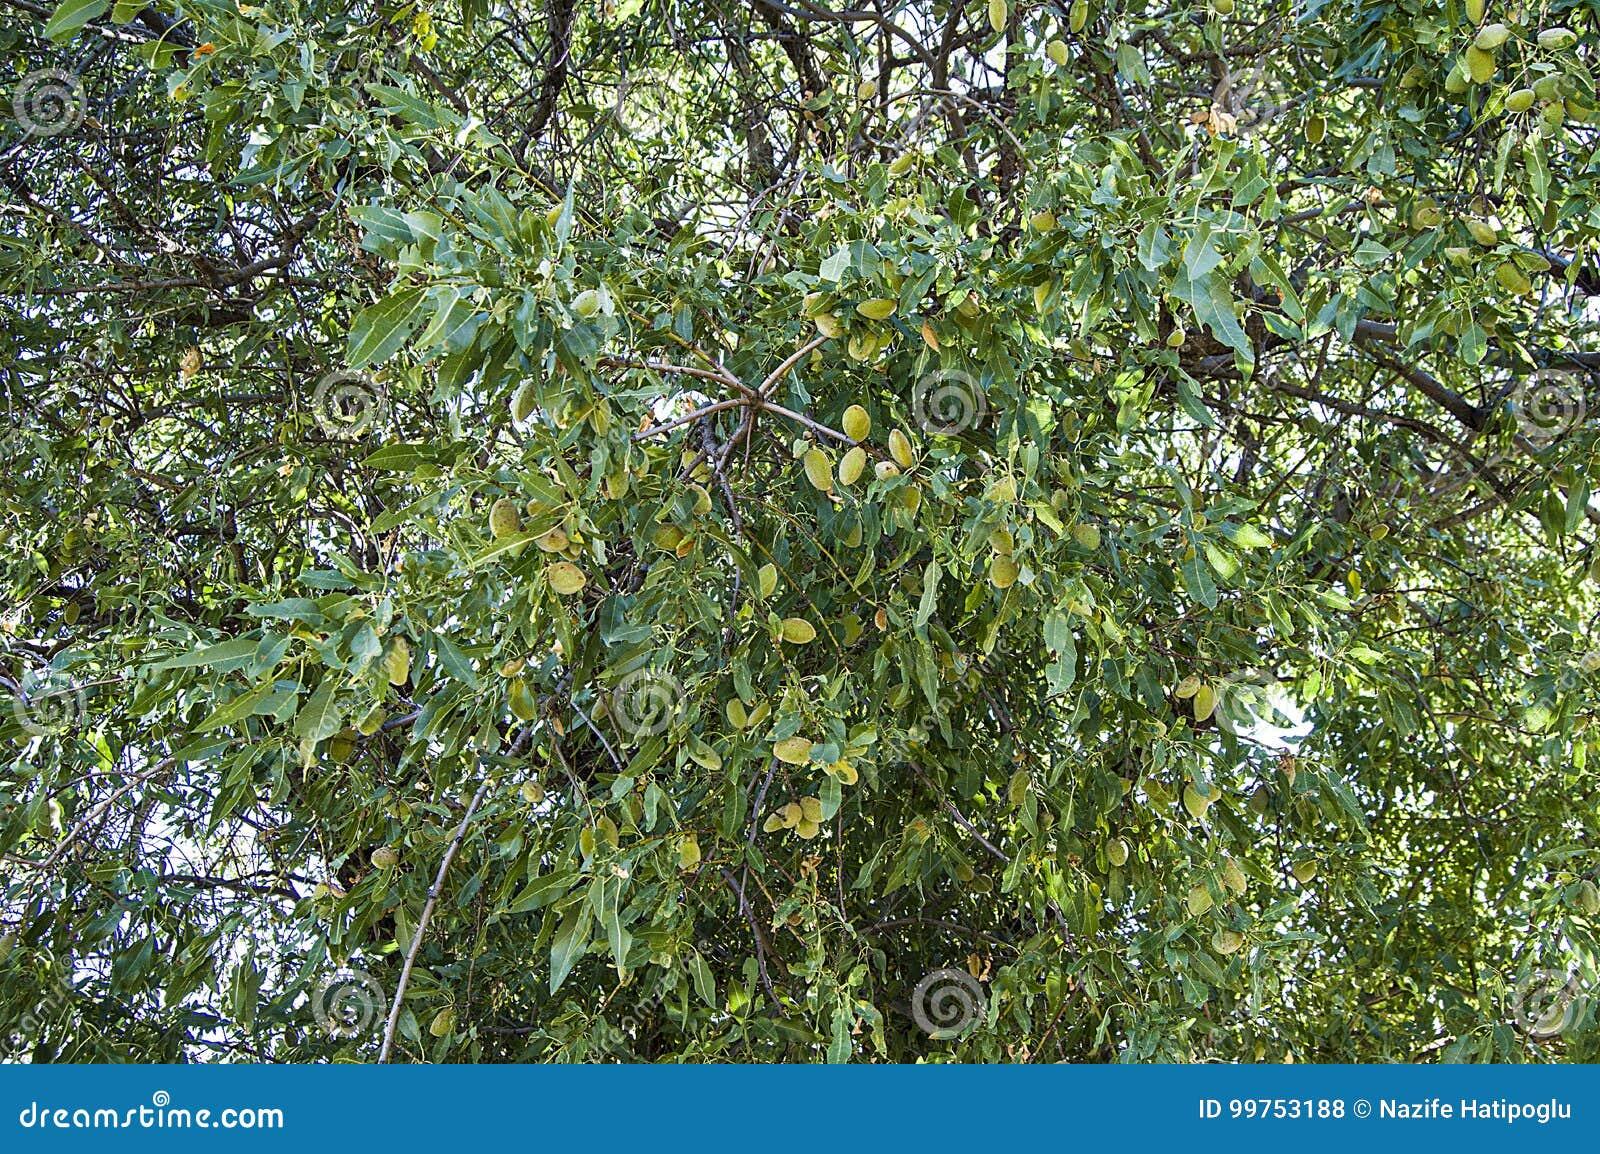 Almond tree mature